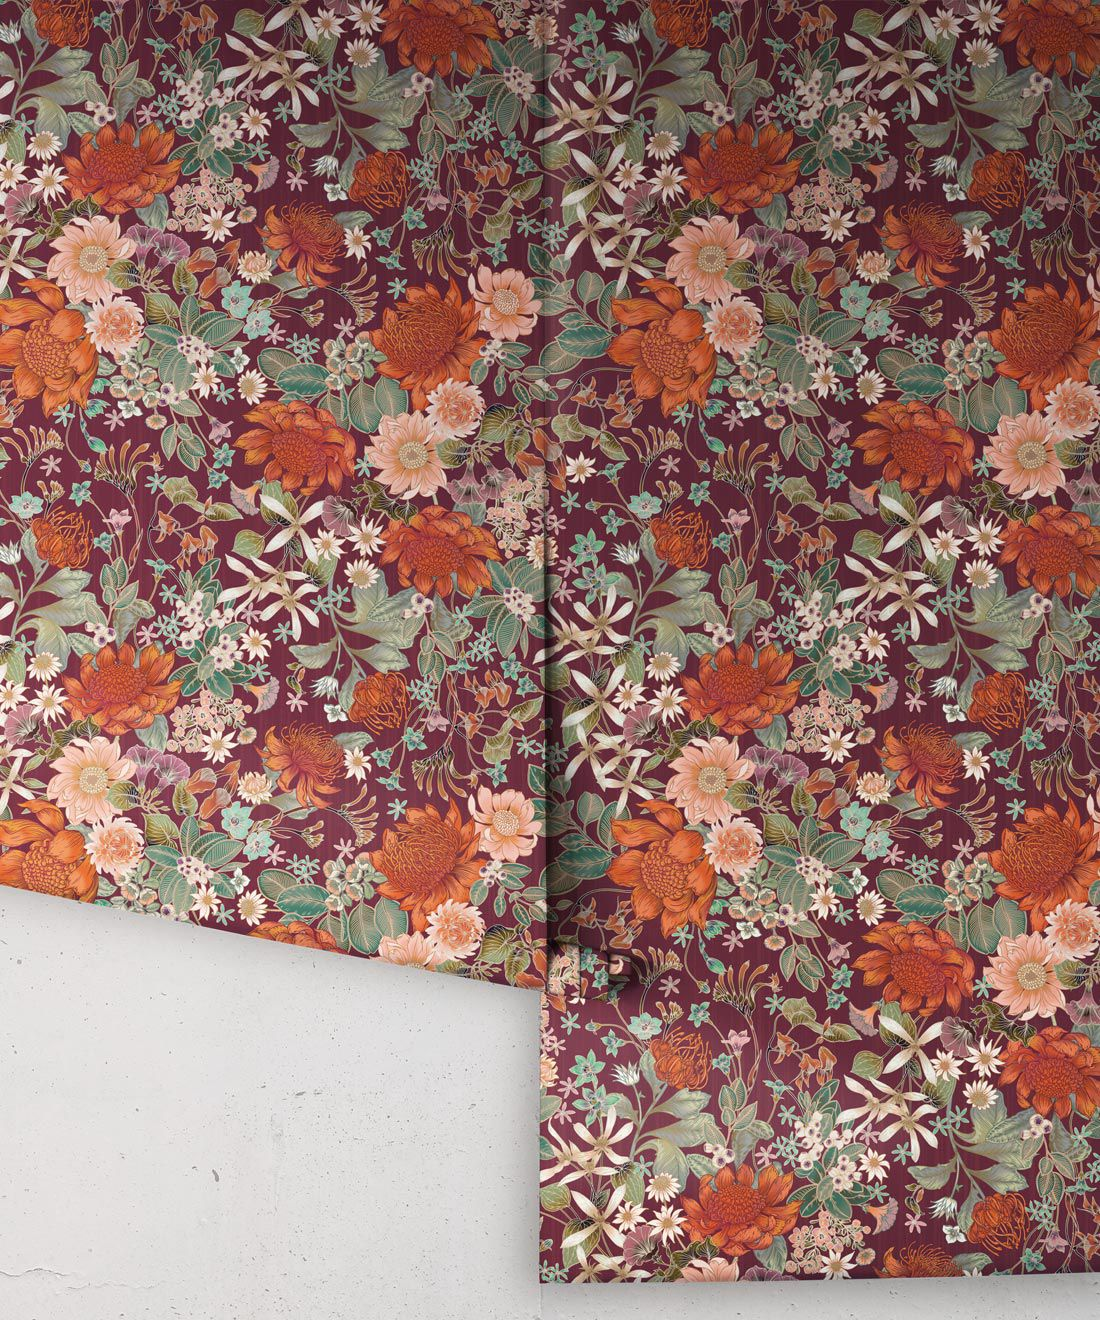 Bouquet Wallpaper • Eloise Short • Vintage Floral Wallpaper •Granny Chic Wallpaper • Grandmillennial Style Wallpaper •Mulberry •Rolls